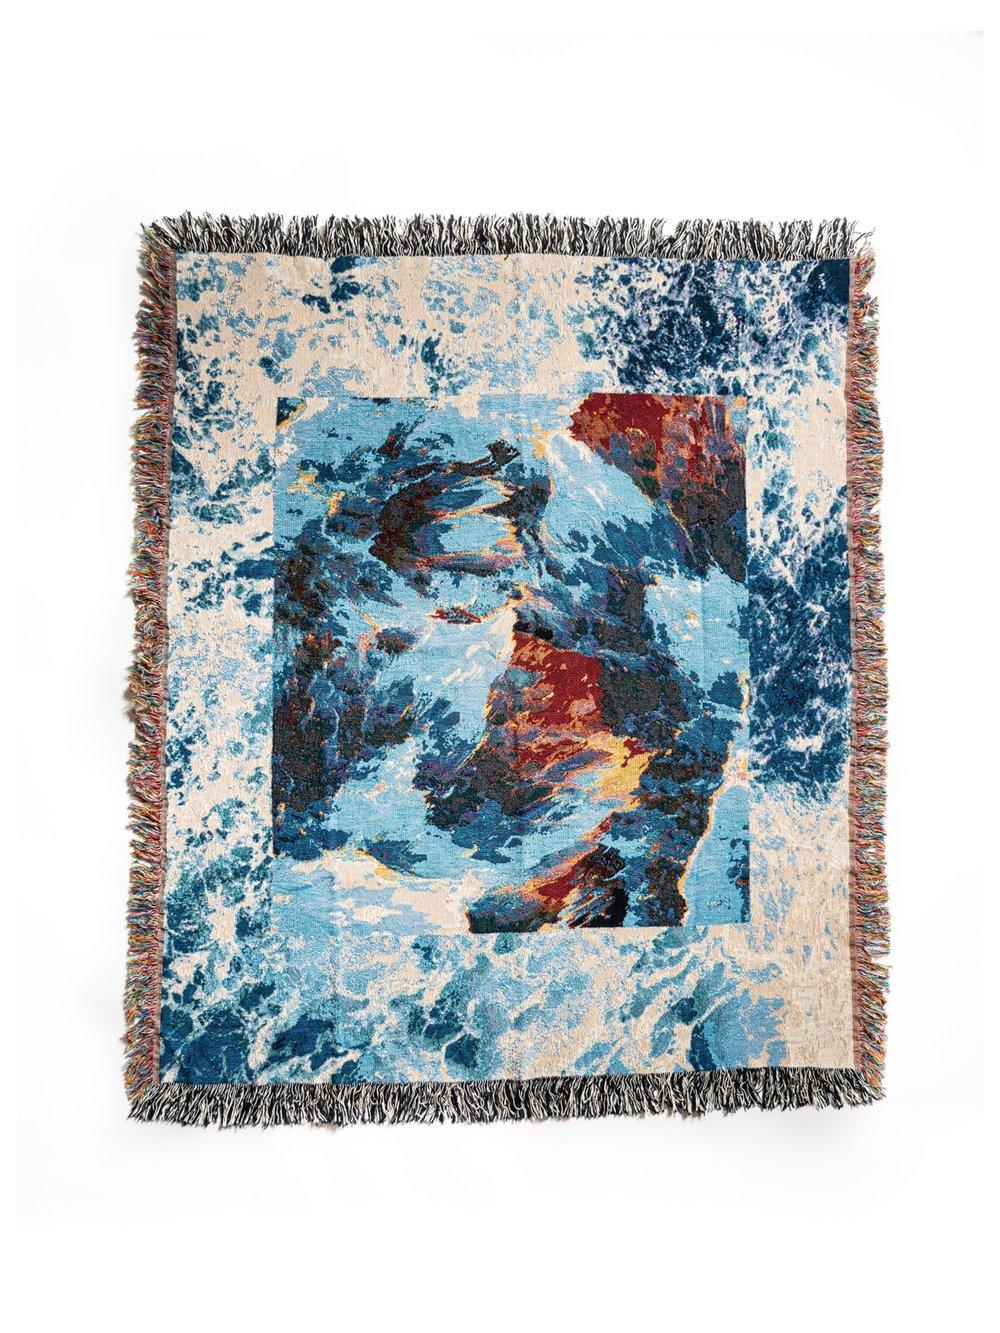 Woven Blanket #28